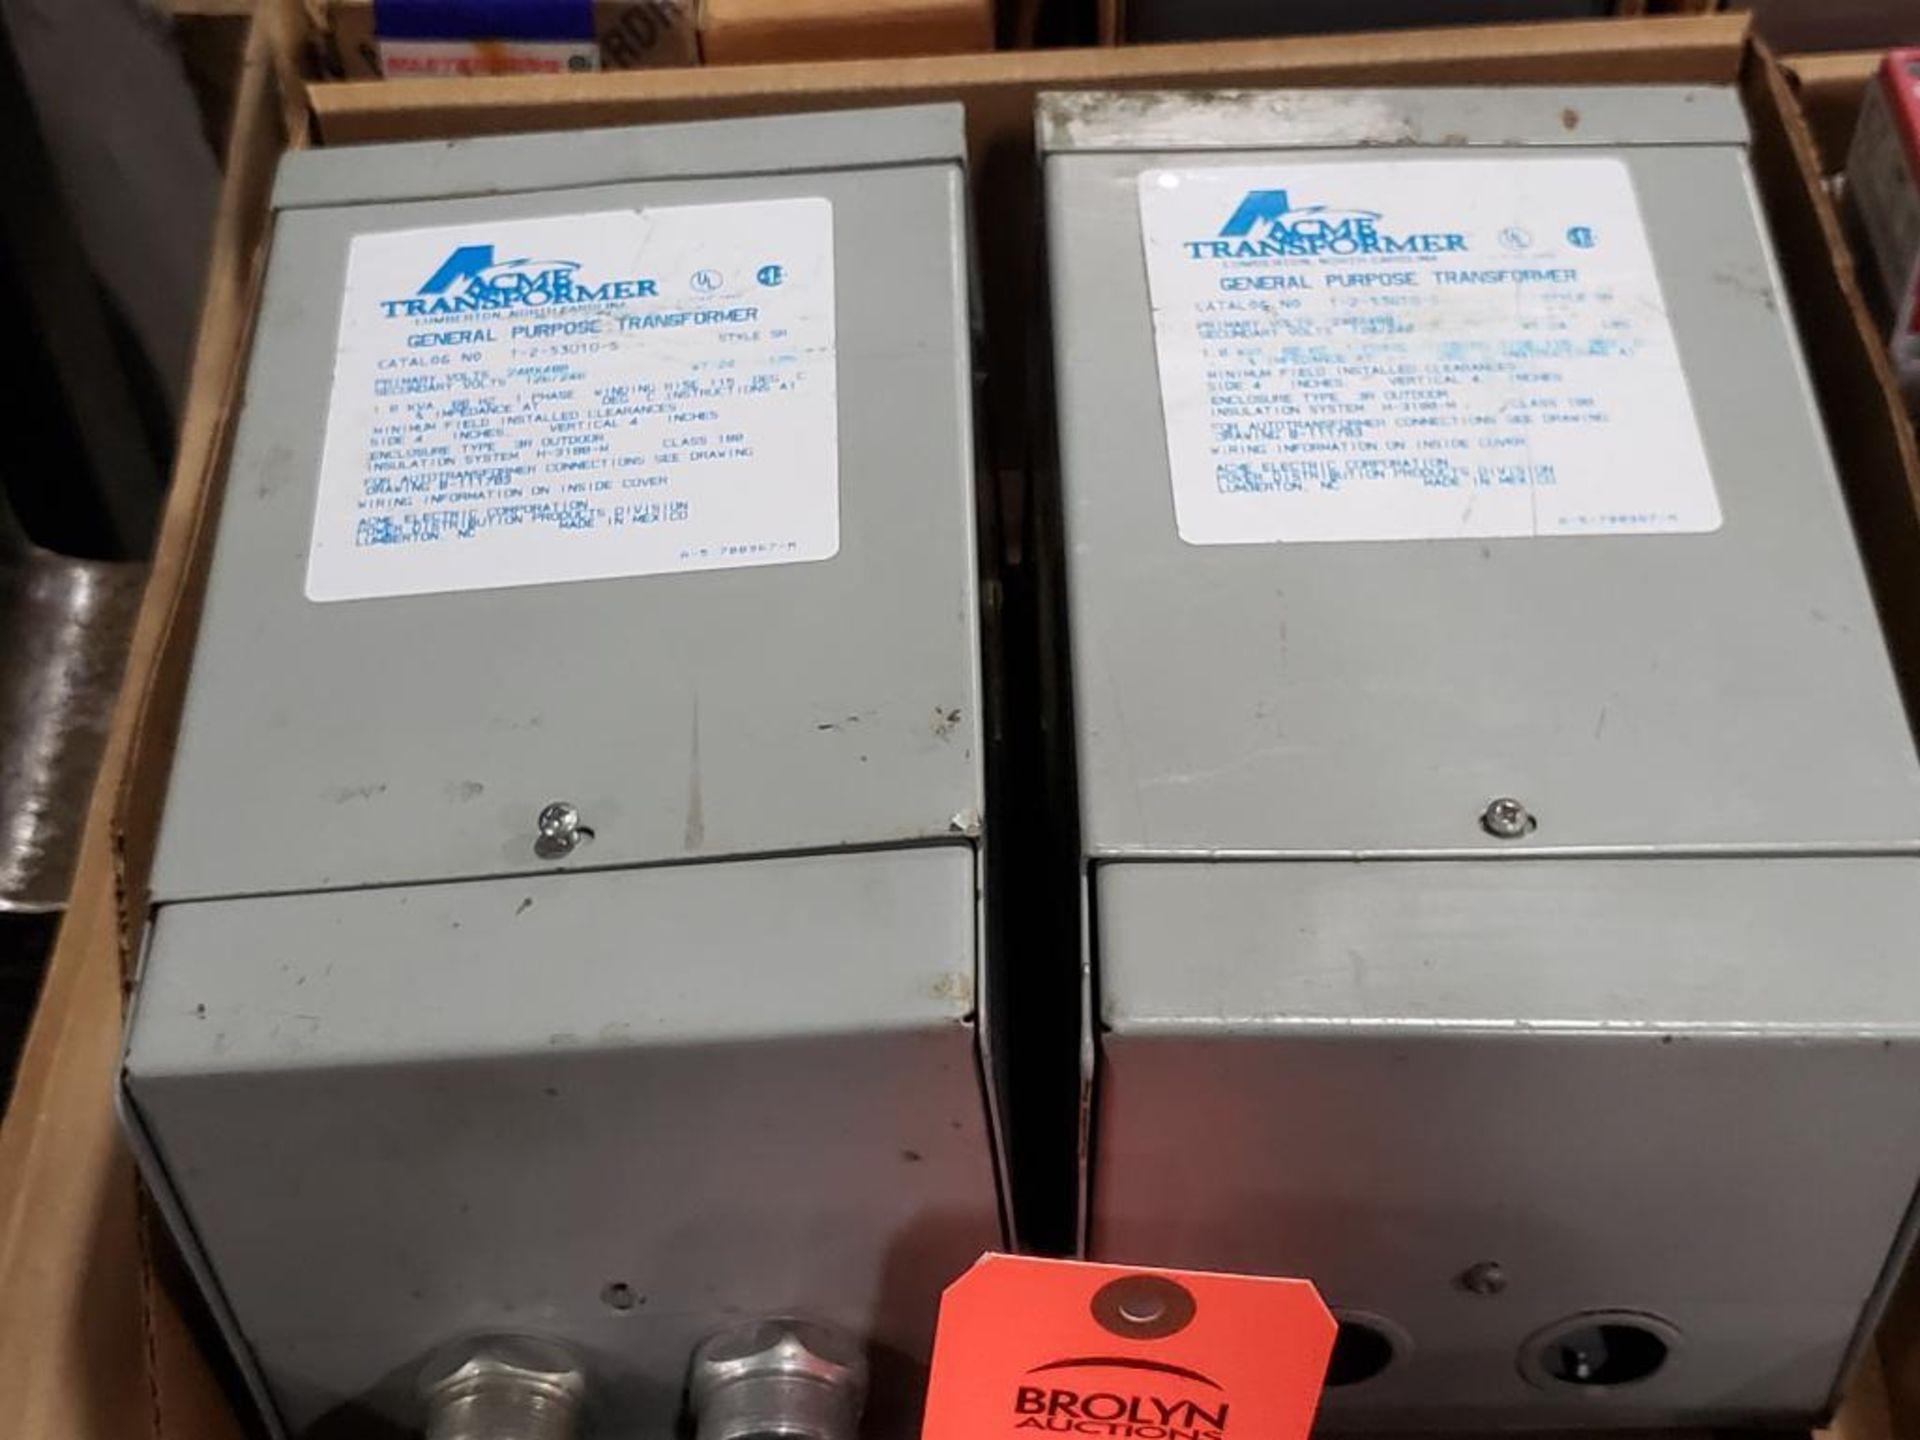 Qty 2 - ACME Transformer T-2-53010-S General purpose transformer.